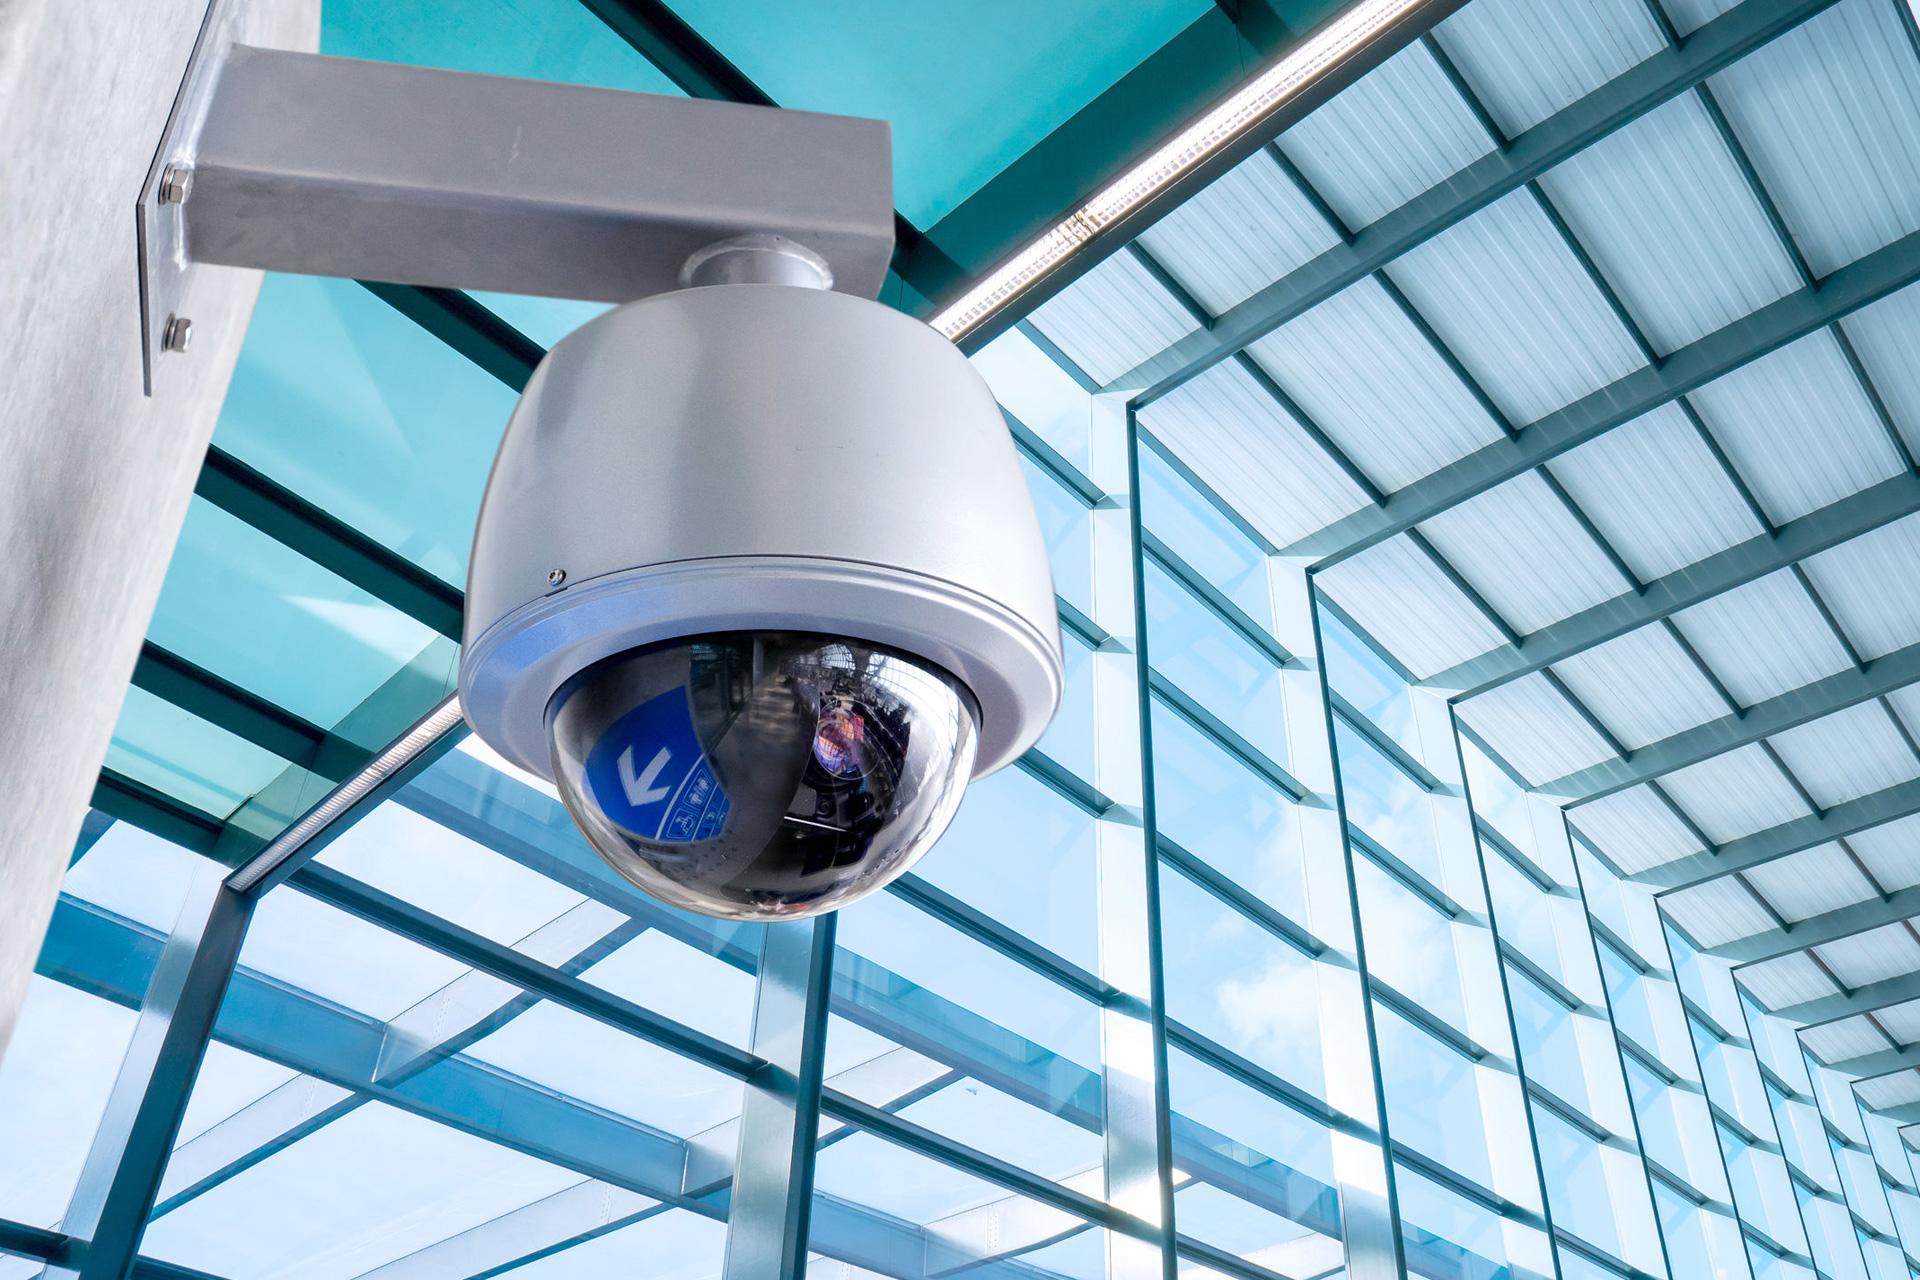 BlueIP - CCTV